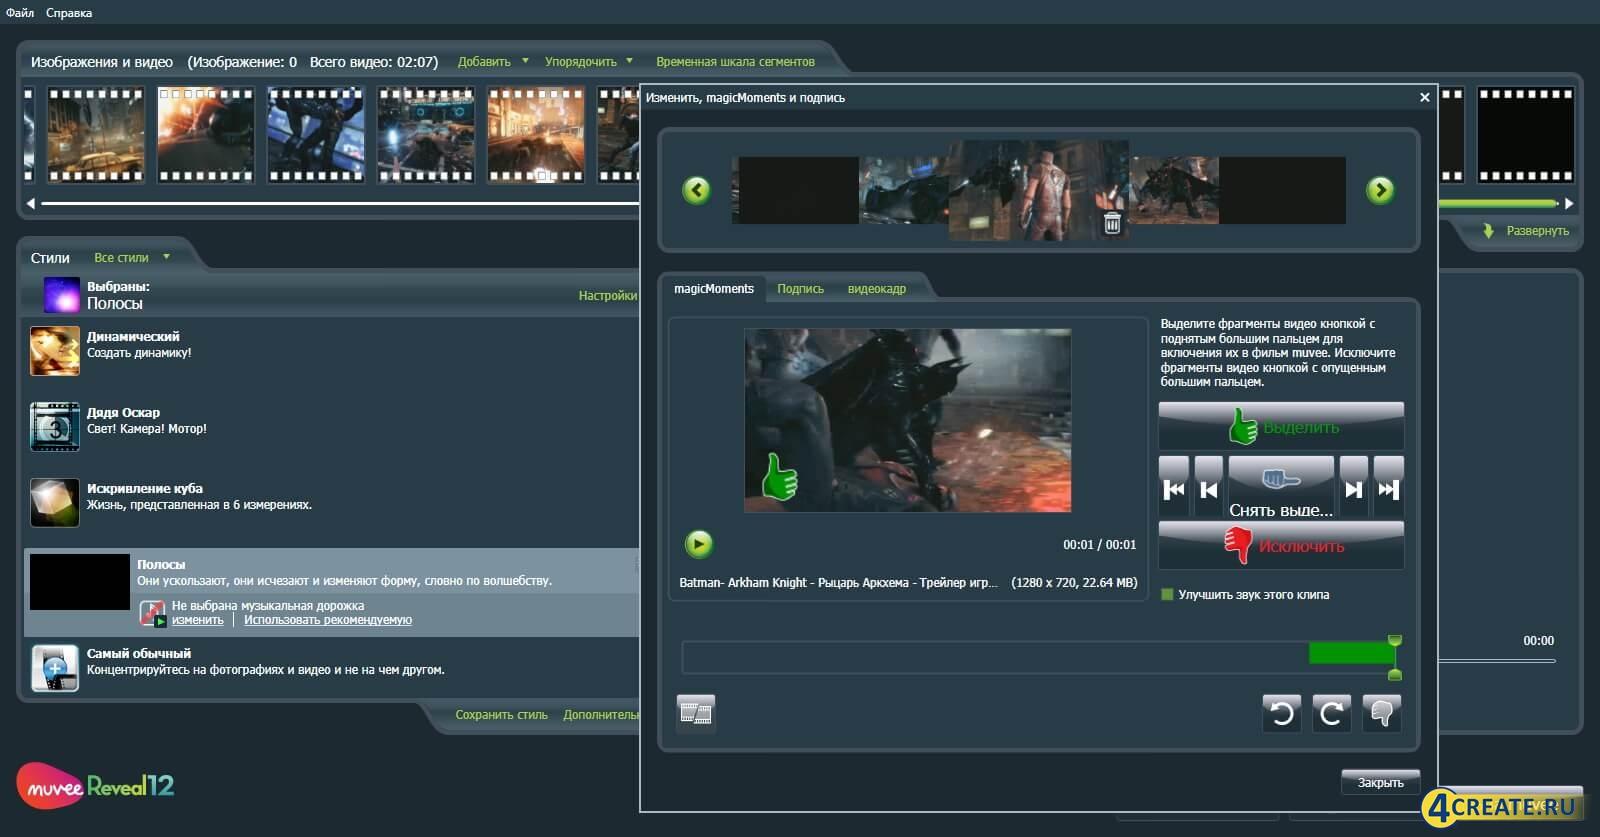 muvee Reveal 12 (Скриншот 2)